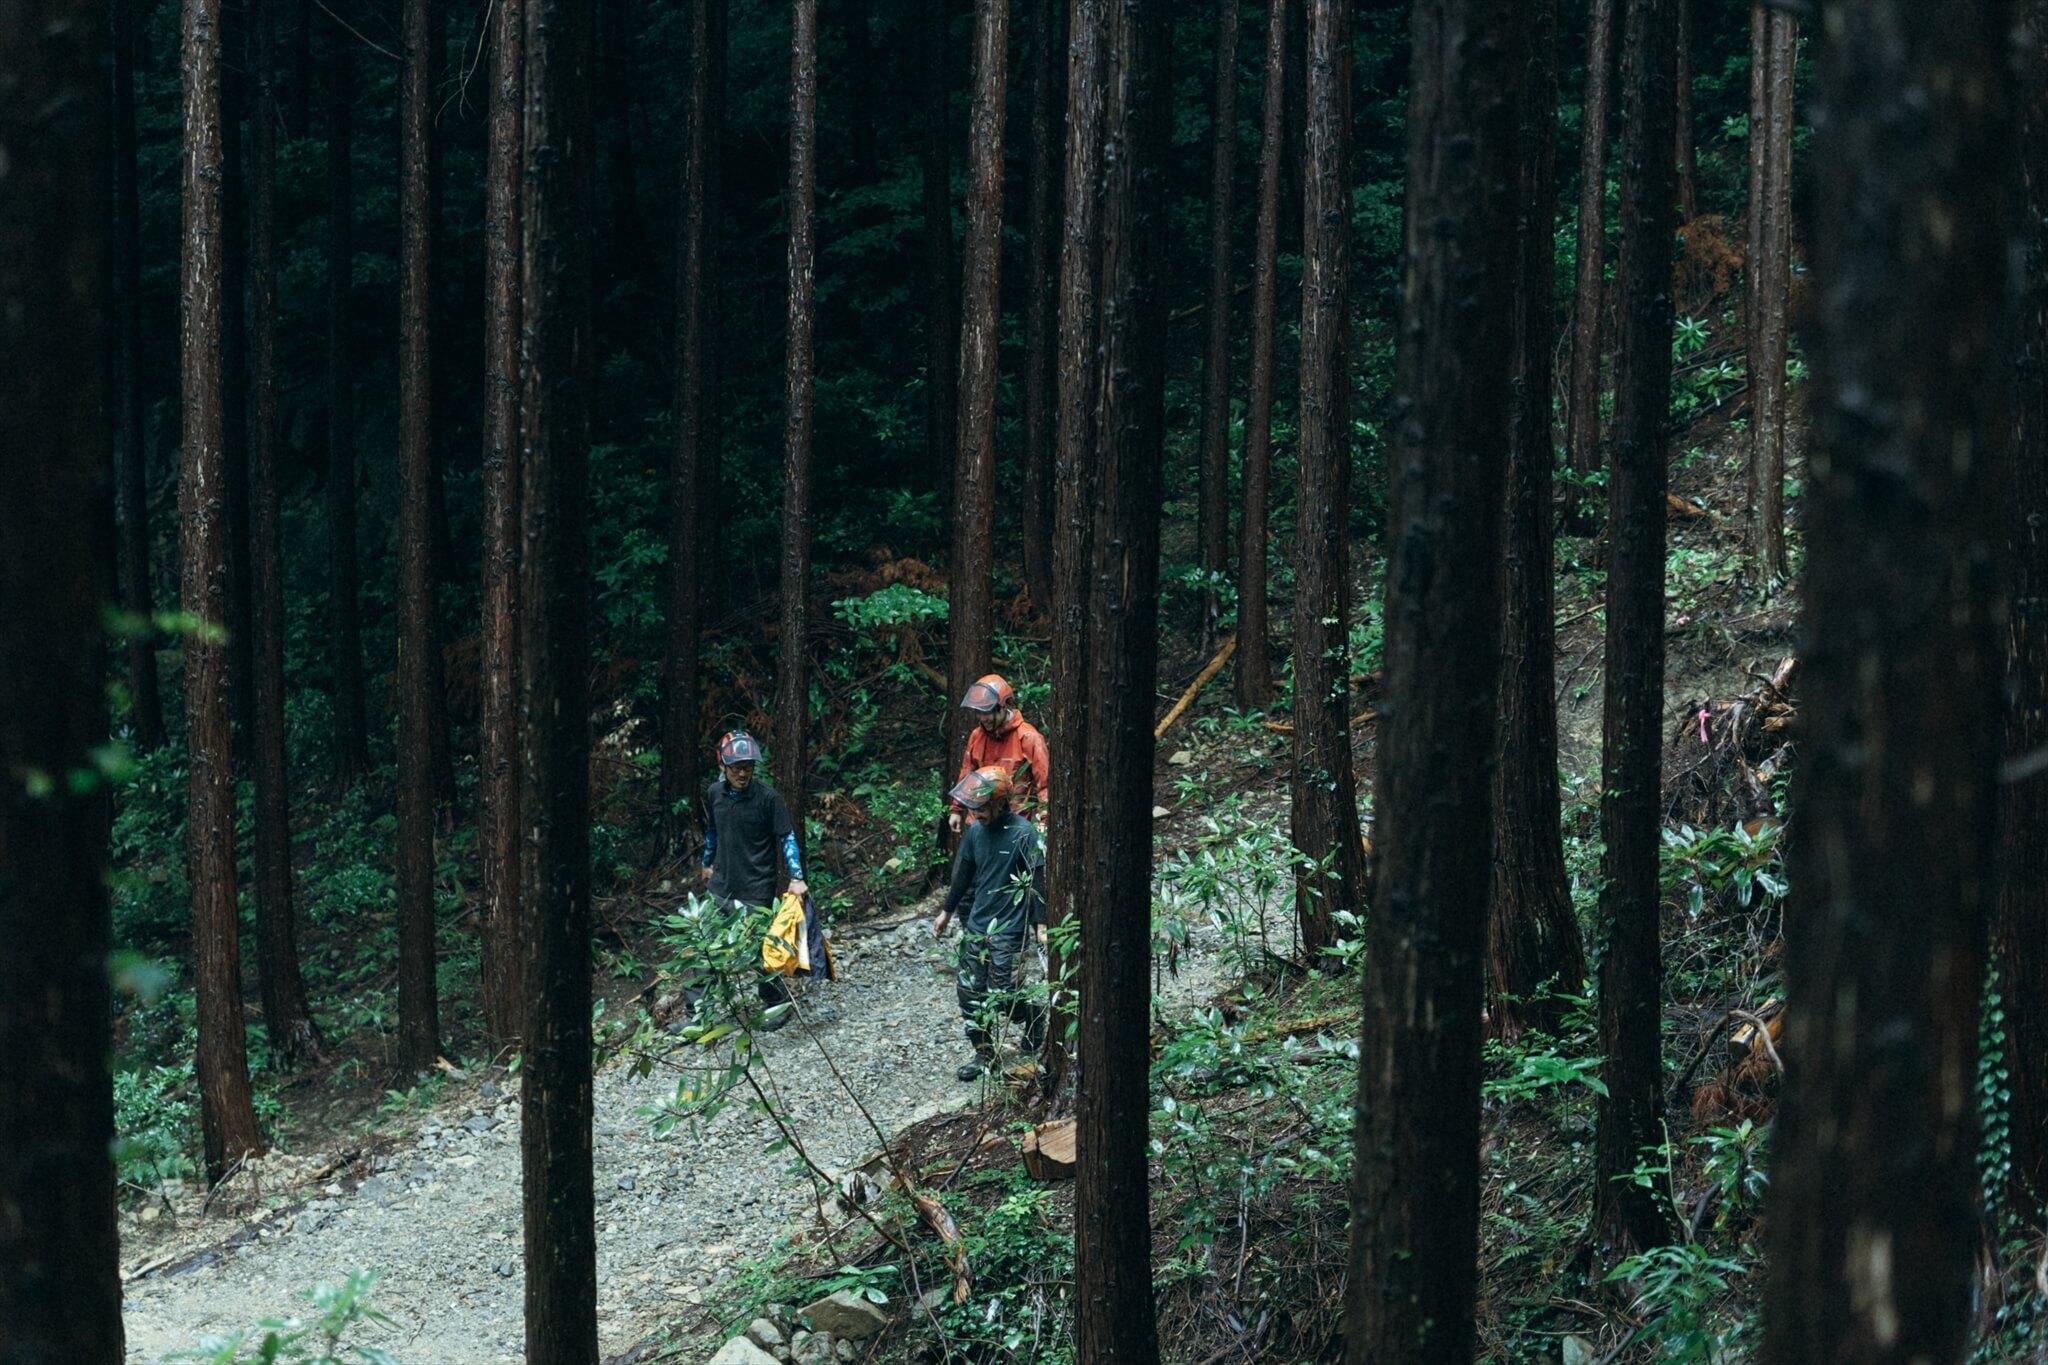 山口県,阿武町,漁業,林業,複業,移住,地域おこし協力隊,自伐型林業